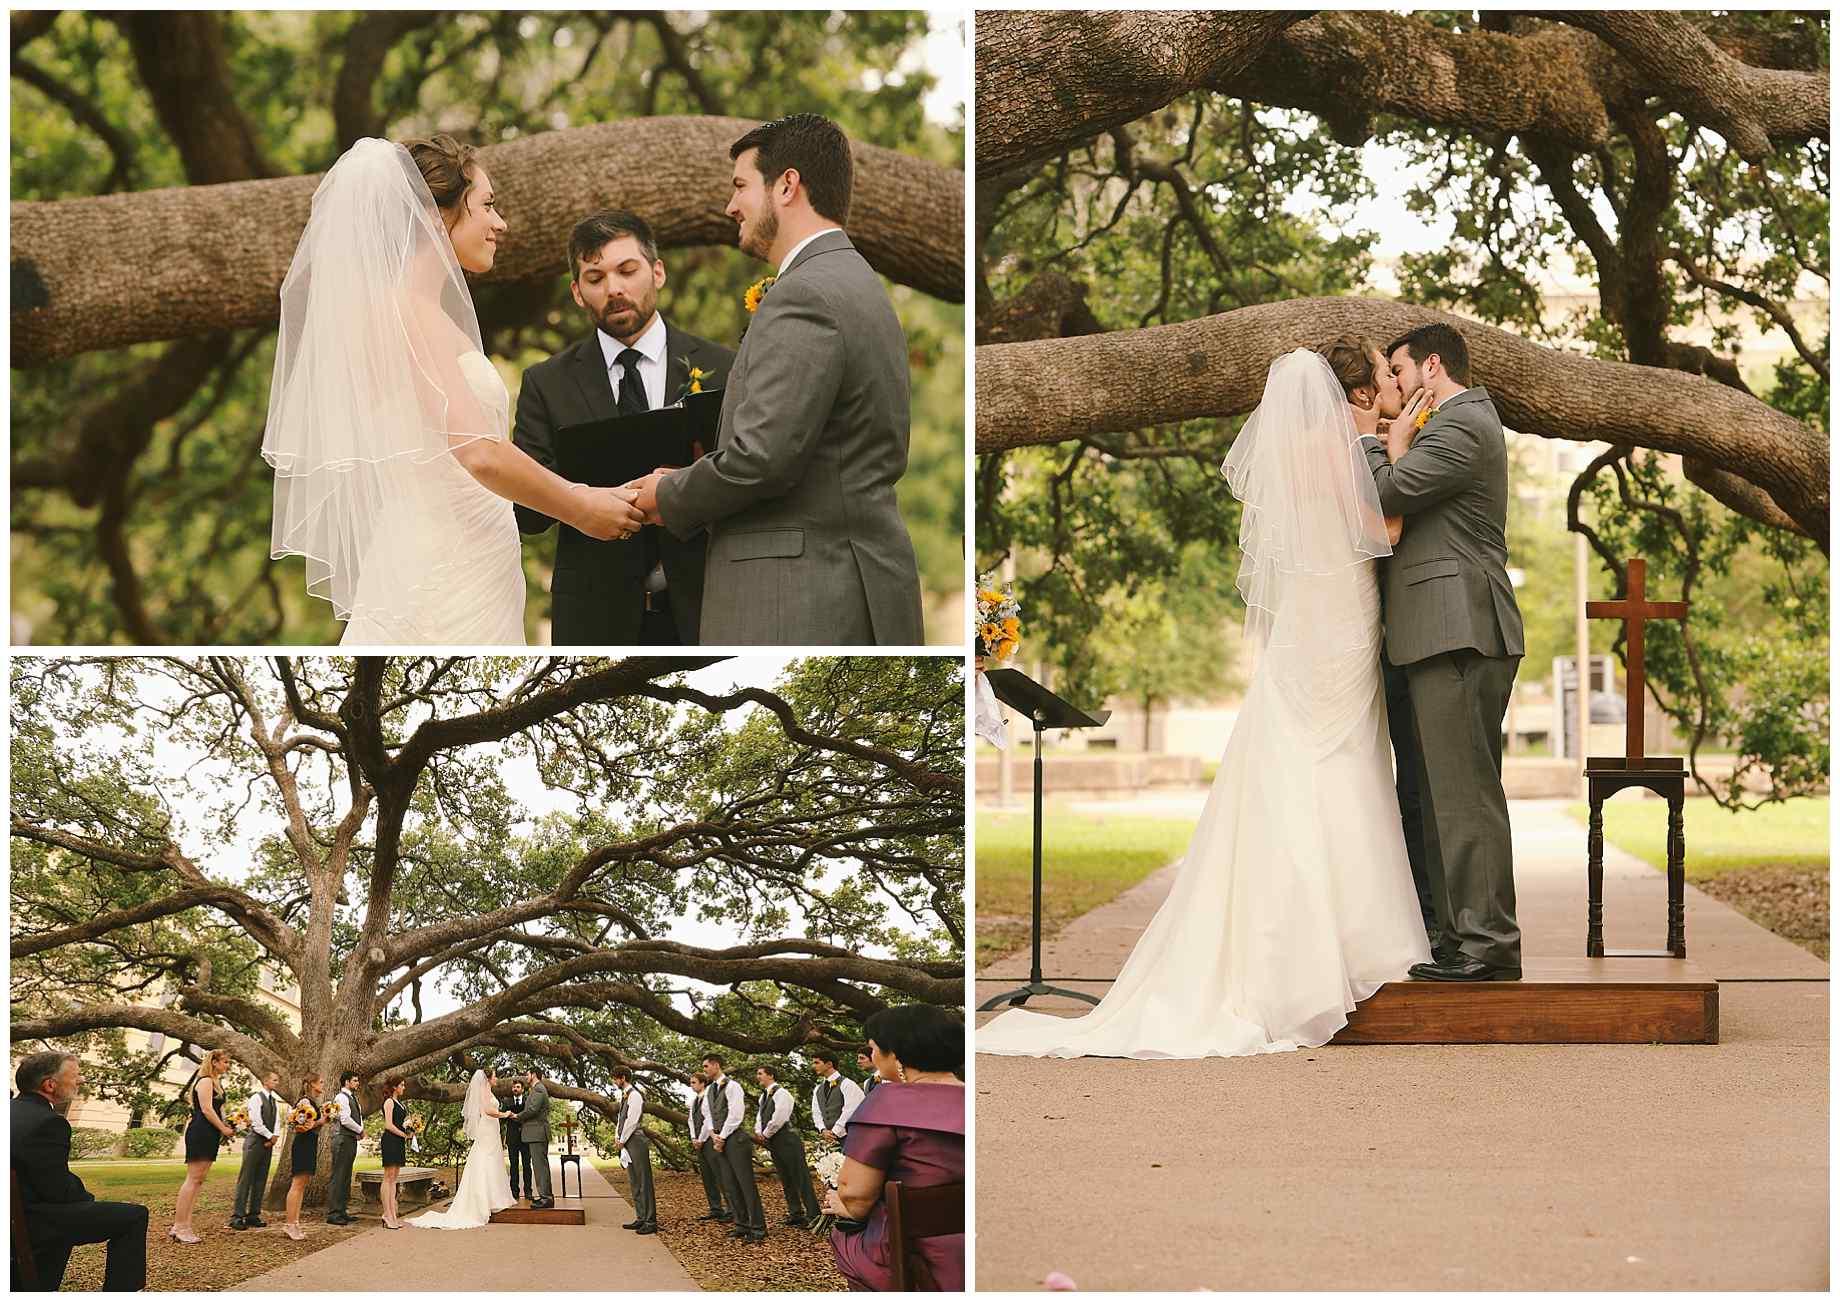 aggie-century-tree-wedding-16